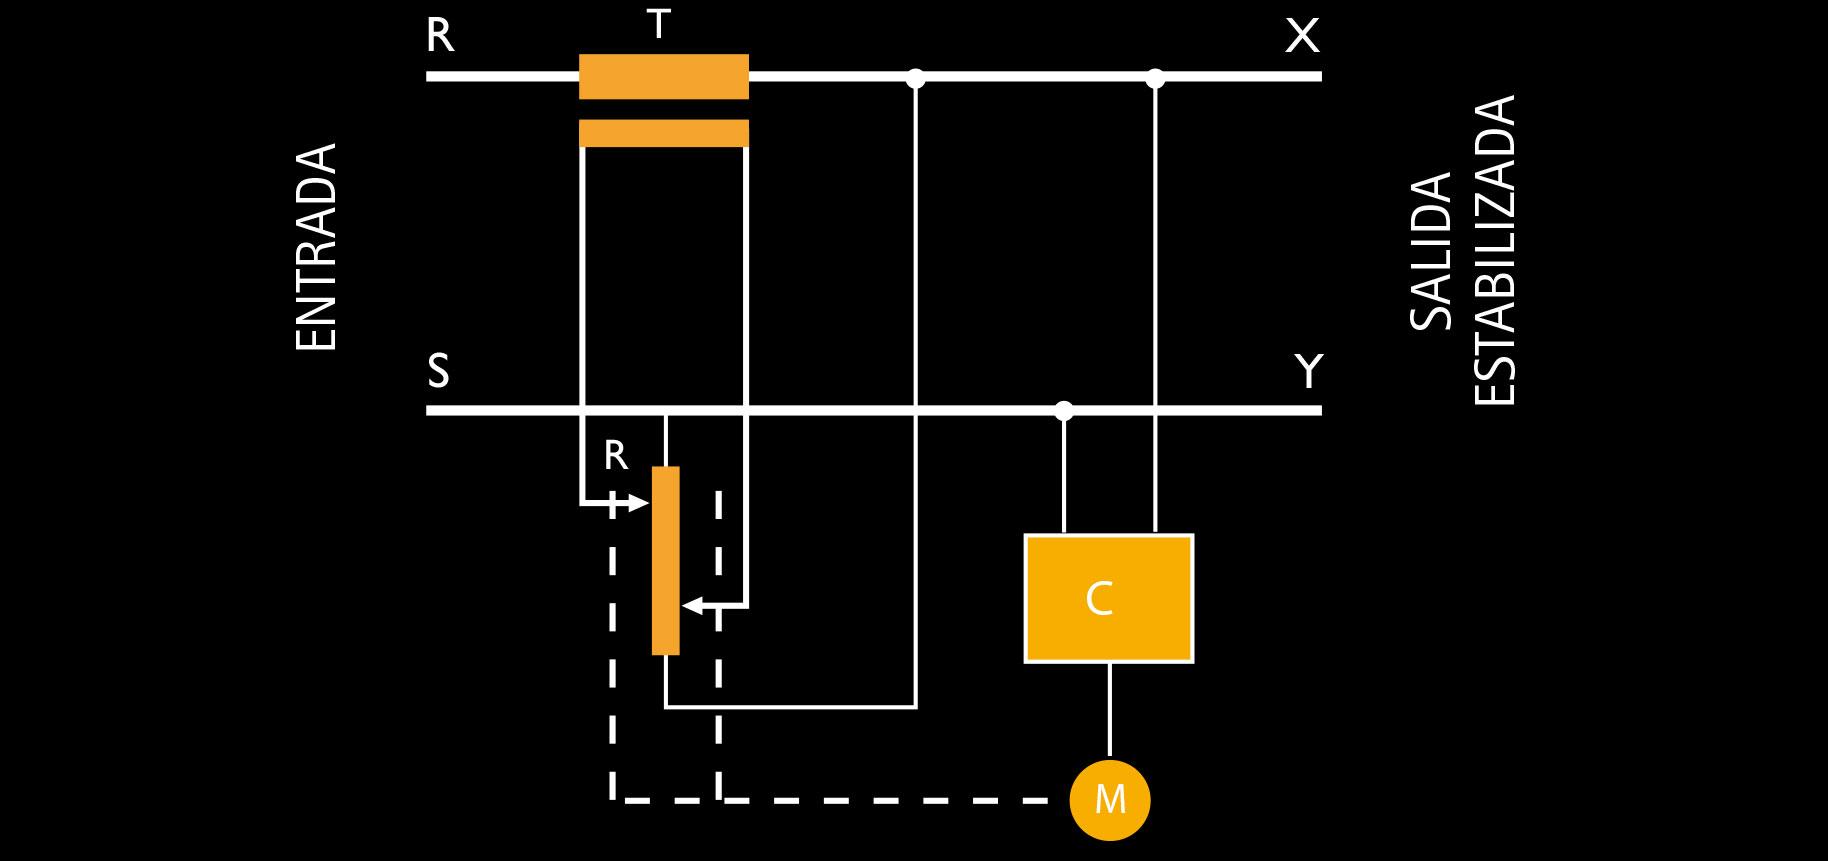 IREM grafico estabilizadores automaticos de tension MONOFASICO - SERIE-M